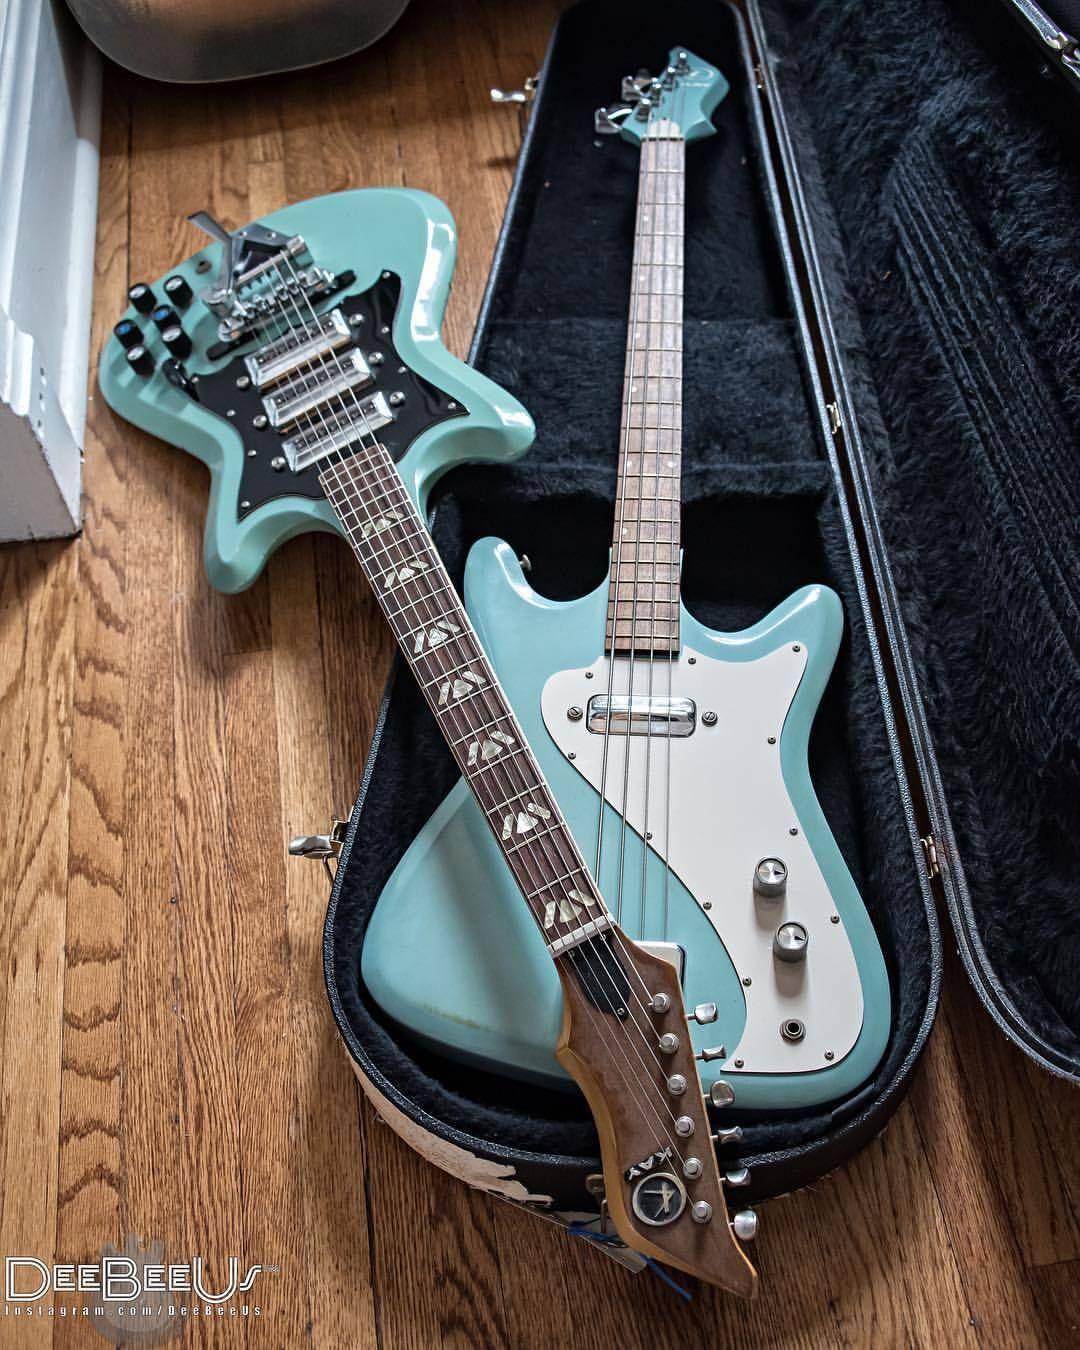 Deebeeus Vintage Guitars Russian Guitar Vintage Electric Guitars